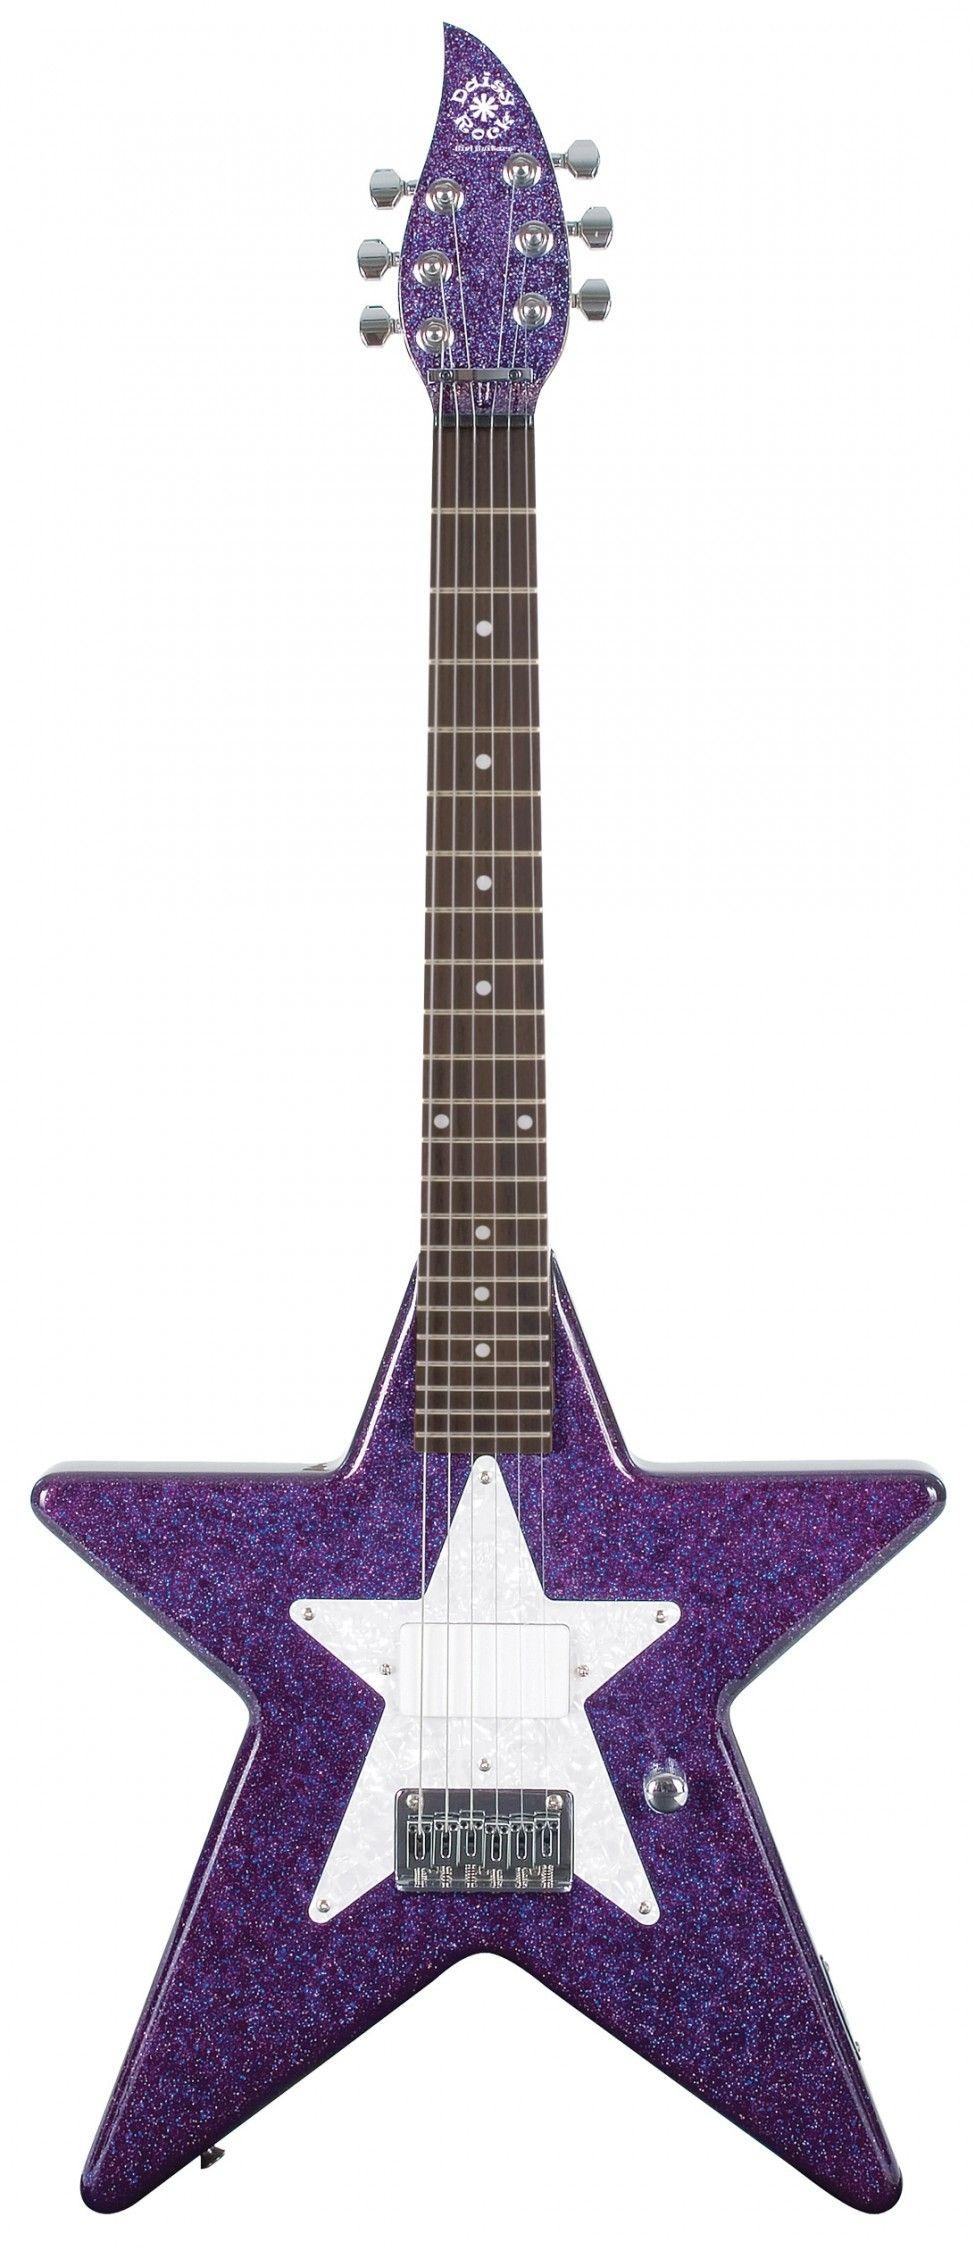 debutante star short scale daisy rock guitars the girl guitar company slim narrow neck. Black Bedroom Furniture Sets. Home Design Ideas